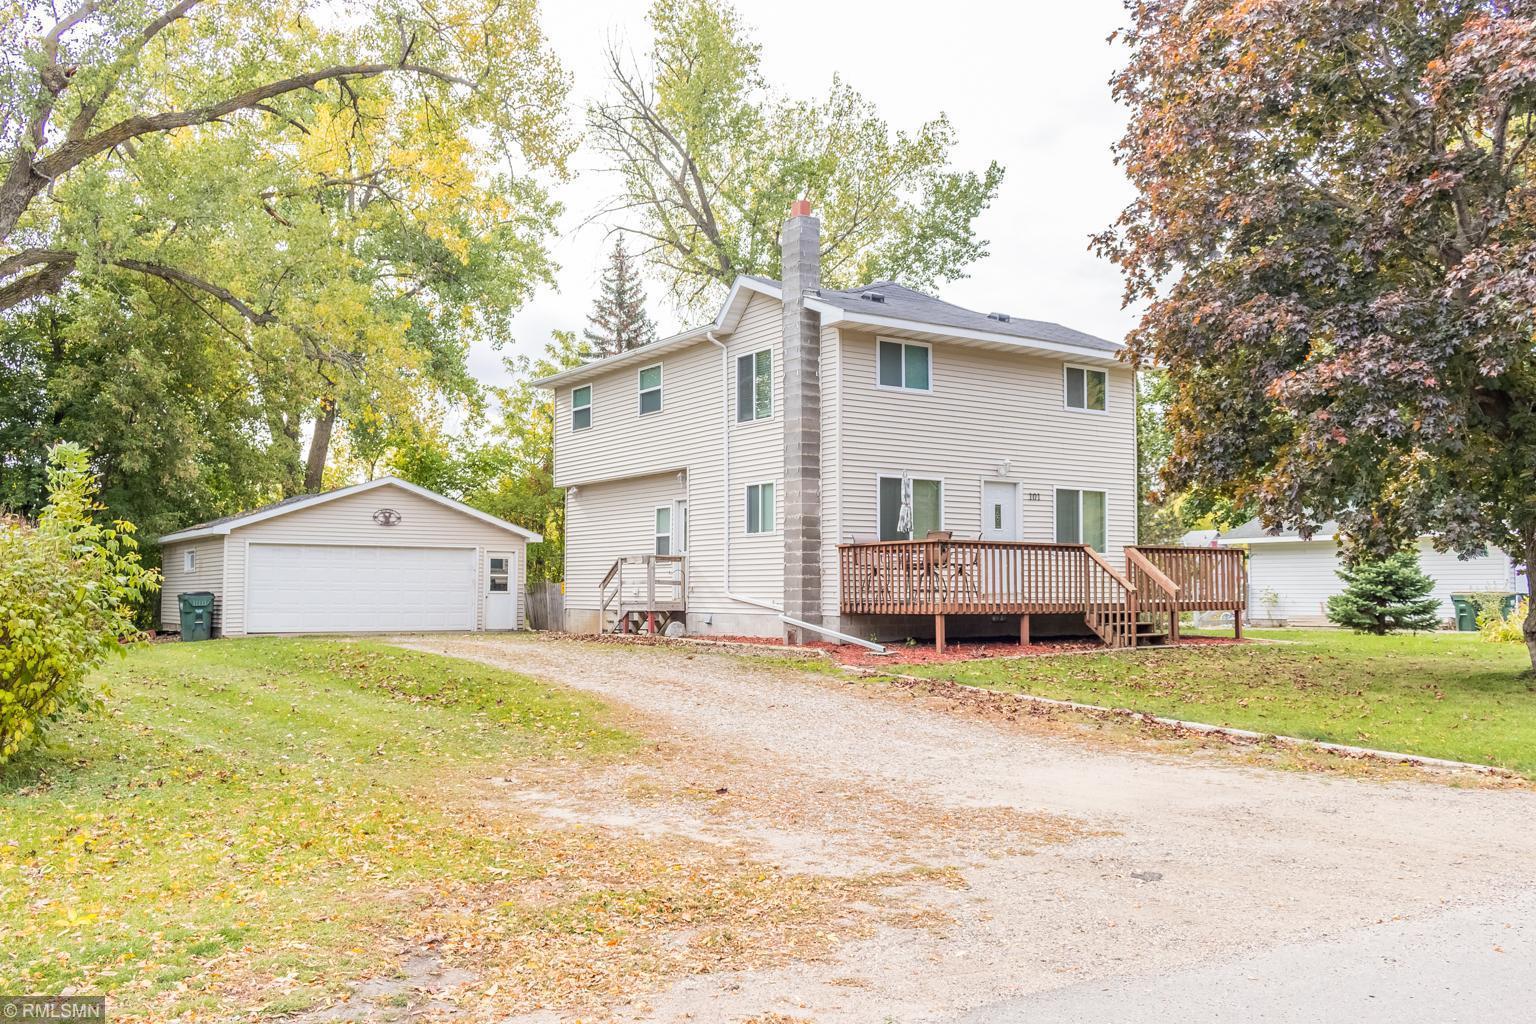 101 Axel Avenue E Property Photo - Grove City, MN real estate listing